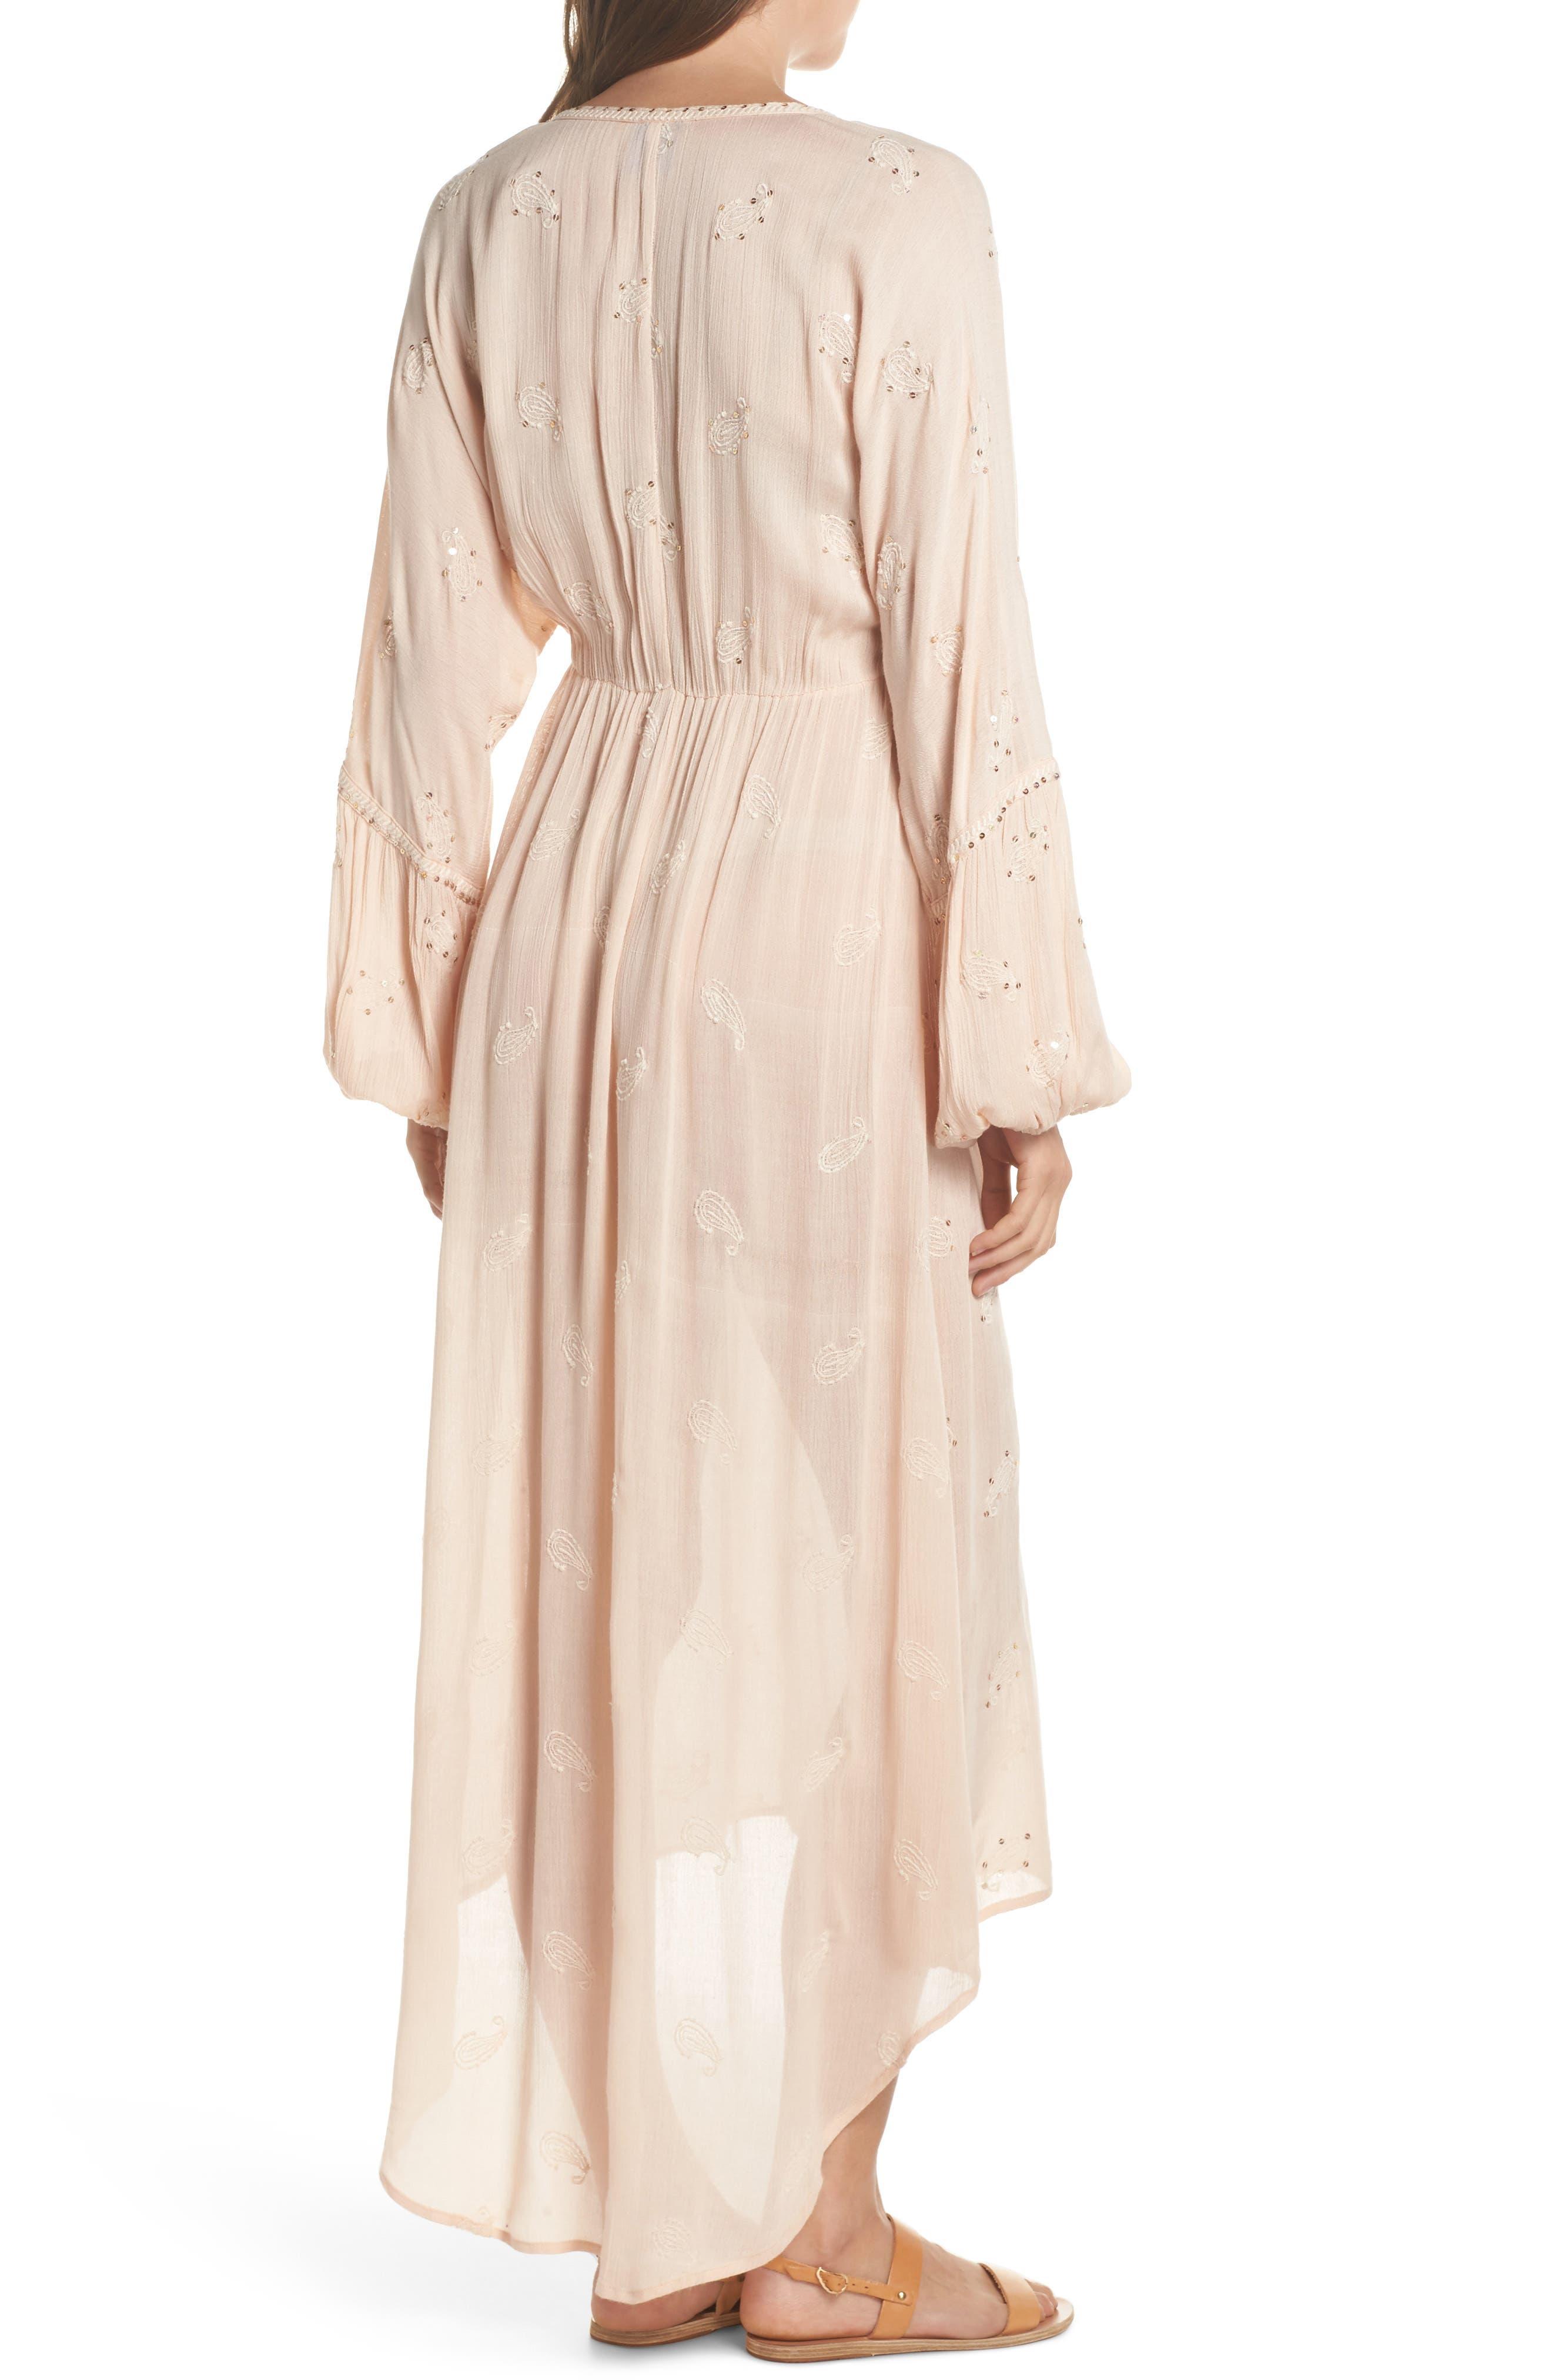 Mercer Cover-Up Maxi Dress,                             Alternate thumbnail 2, color,                             Blush